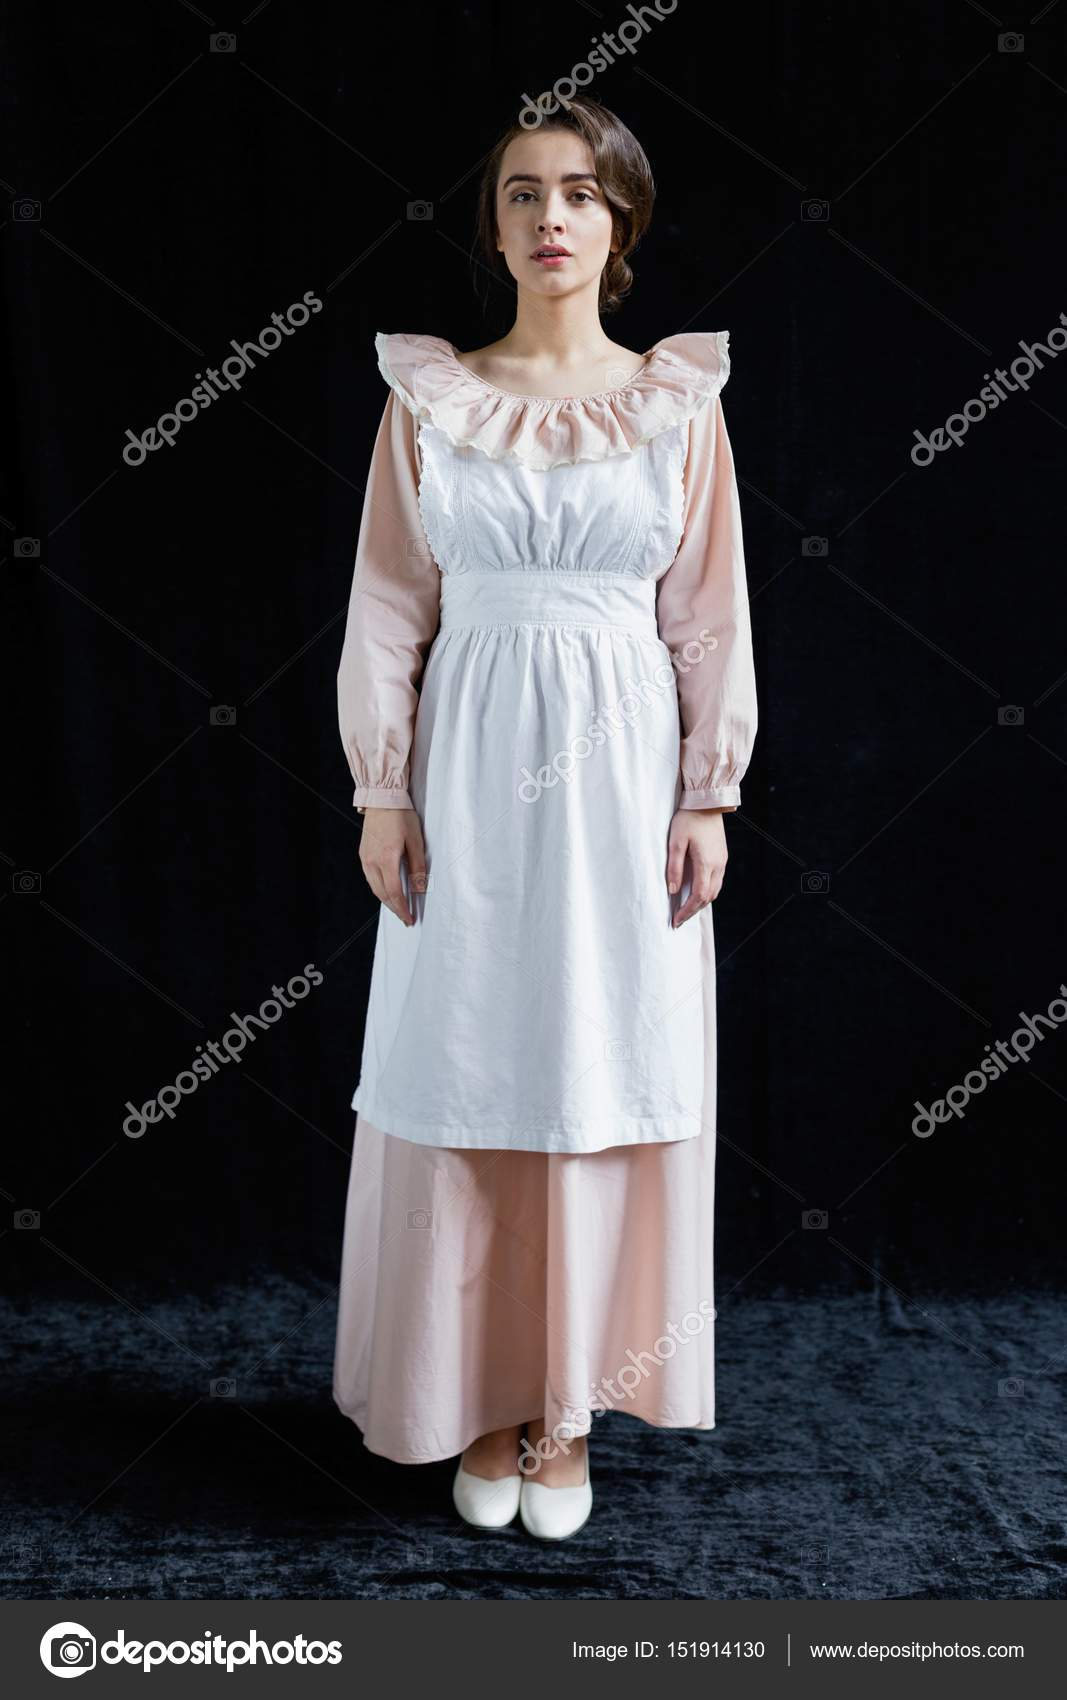 Verwonderend Vrouw in oude ouderwetse jurk — Stockfoto © smmartynenko #151914130 AU-19